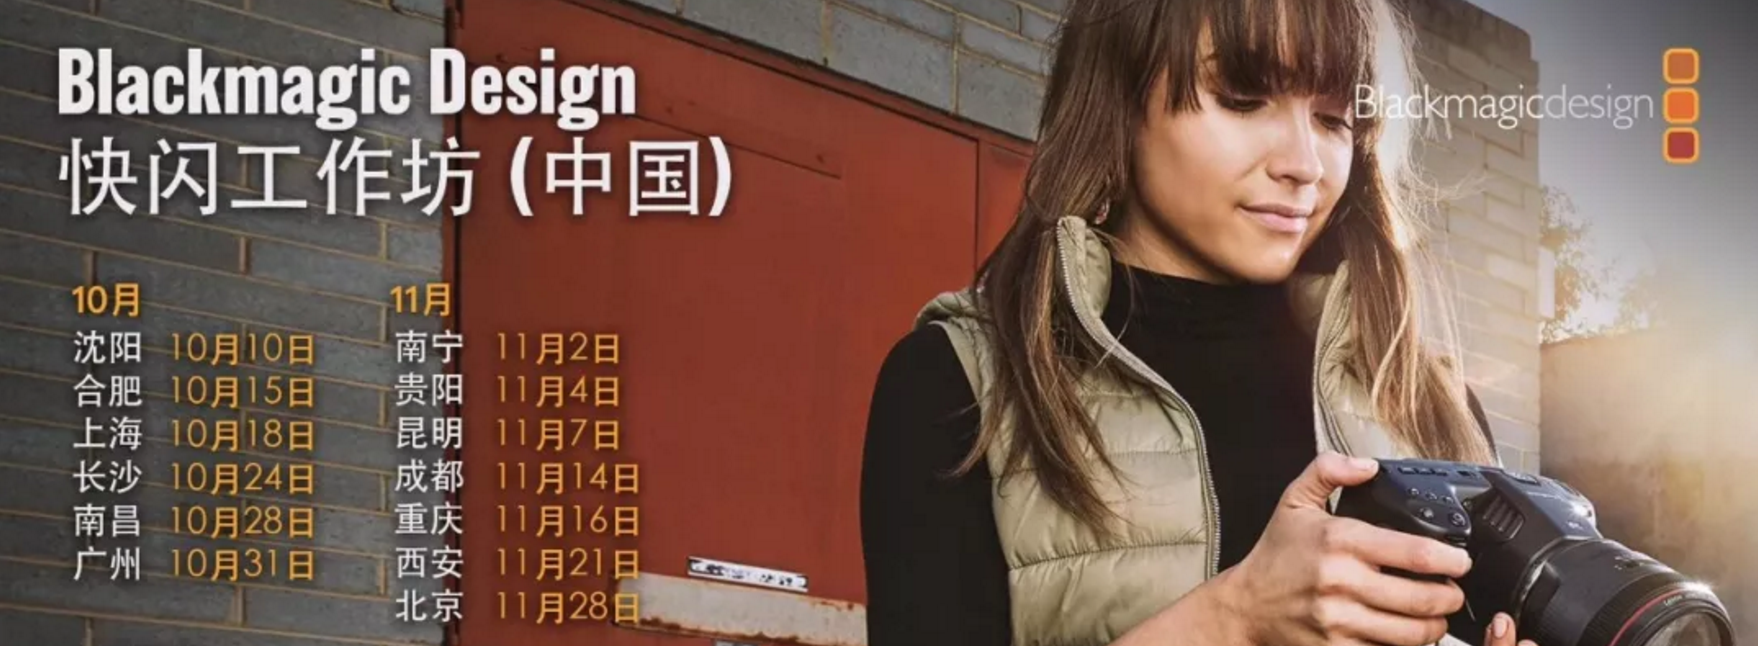 Blackmagic Design快闪工作坊10月份站点精彩回顾